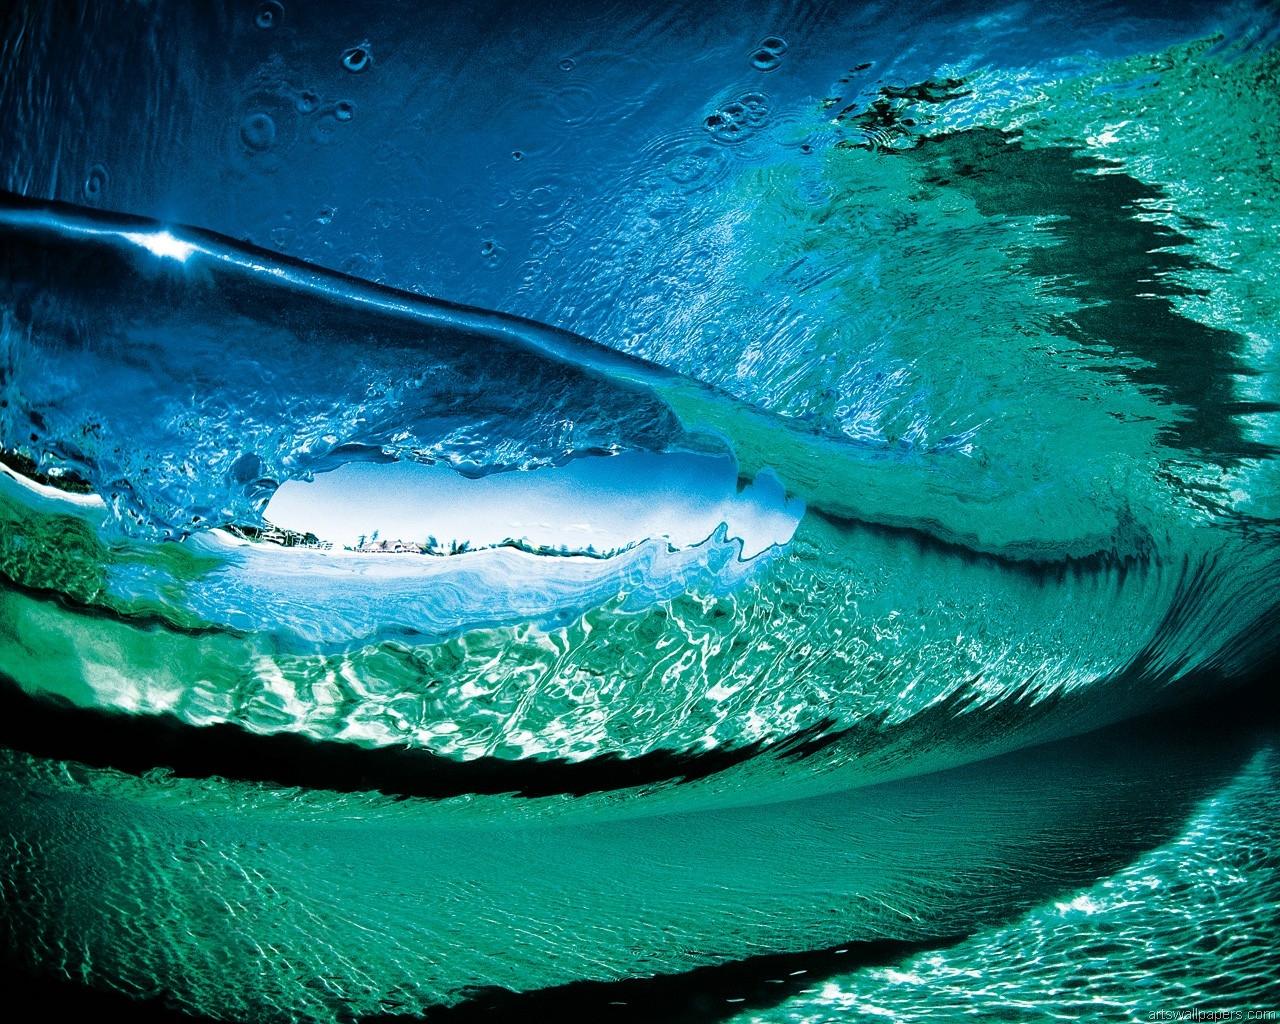 Sea Ocean Wallpaper HD Full HD 1080p Desktop Wallpaper Background 1280x1024